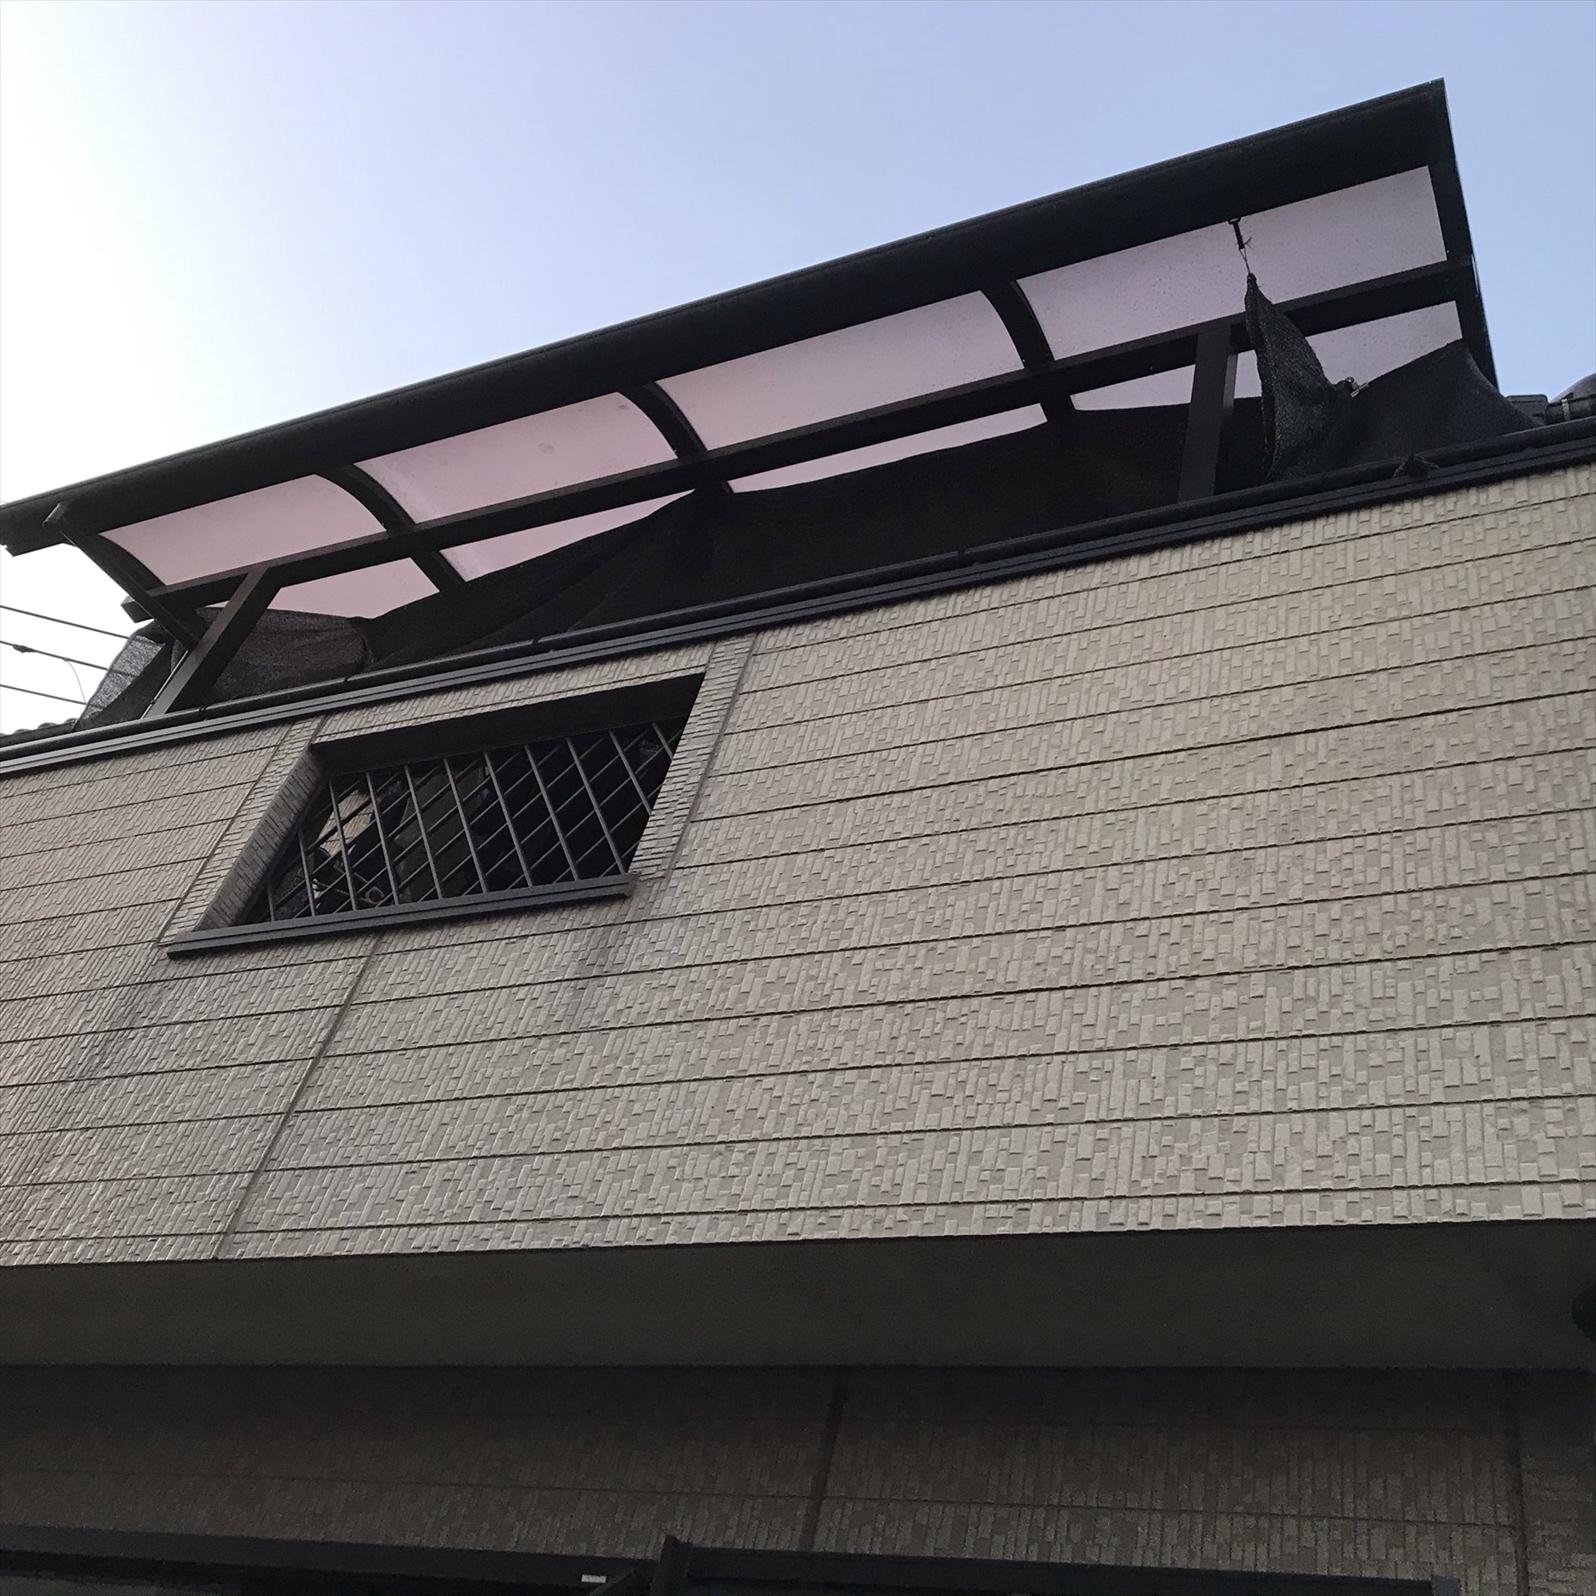 上尾市本町外壁塗装の無料点検ベランダ外壁部分状態